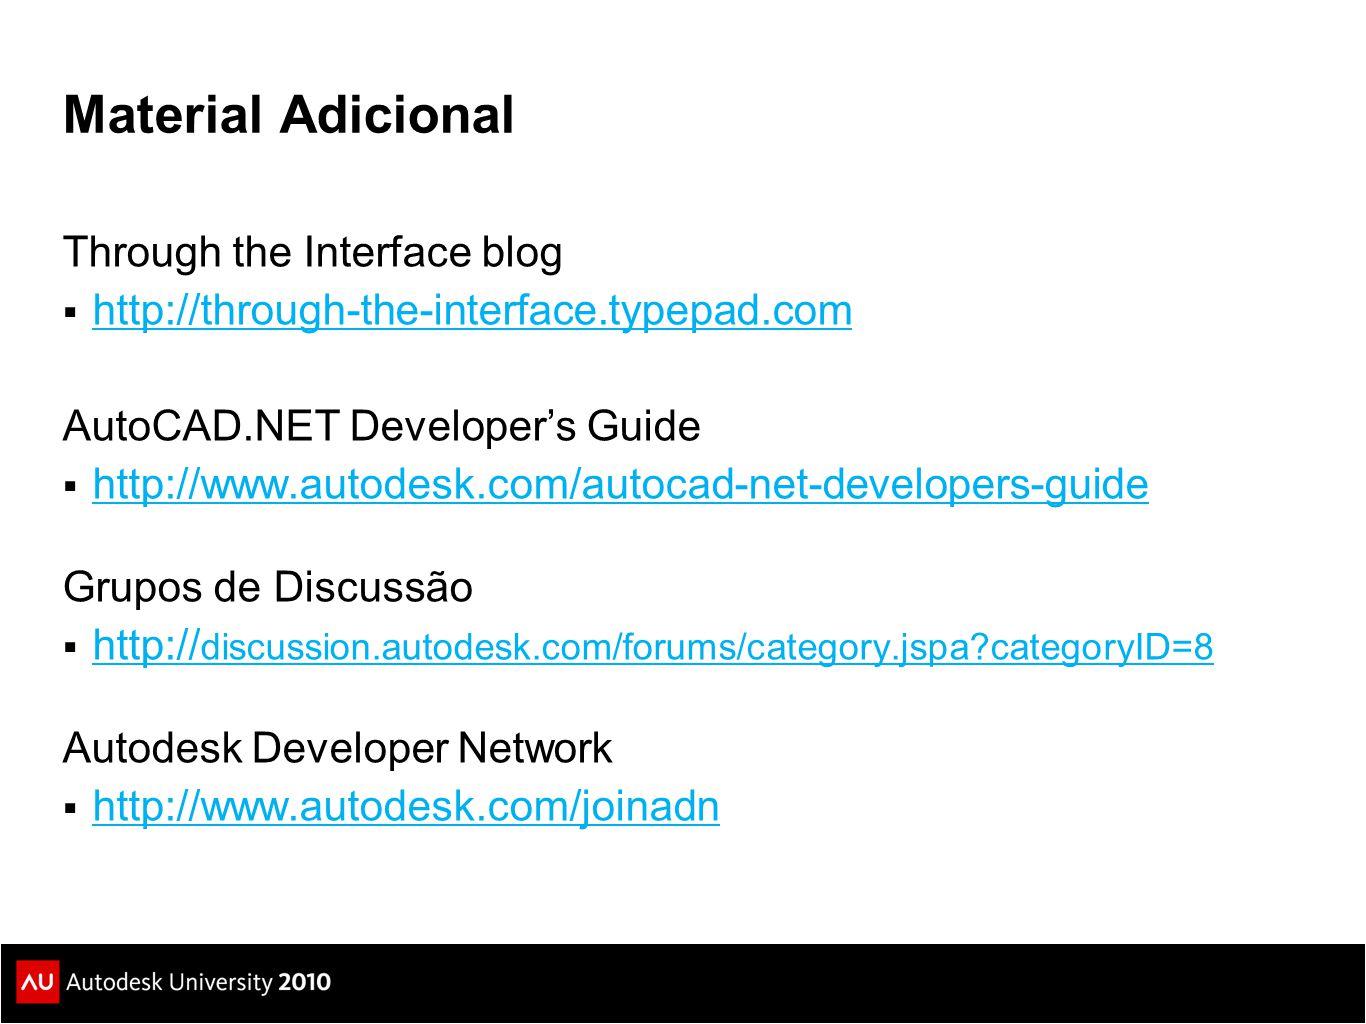 Material Adicional Through the Interface blog  http://through-the-interface.typepad.com http://through-the-interface.typepad.com AutoCAD.NET Developer's Guide  http://www.autodesk.com/autocad-net-developers-guide http://www.autodesk.com/autocad-net-developers-guide Grupos de Discussão  http:// discussion.autodesk.com/forums/category.jspa?categoryID=8 http:// discussion.autodesk.com/forums/category.jspa?categoryID=8 Autodesk Developer Network  http://www.autodesk.com/joinadn http://www.autodesk.com/joinadn